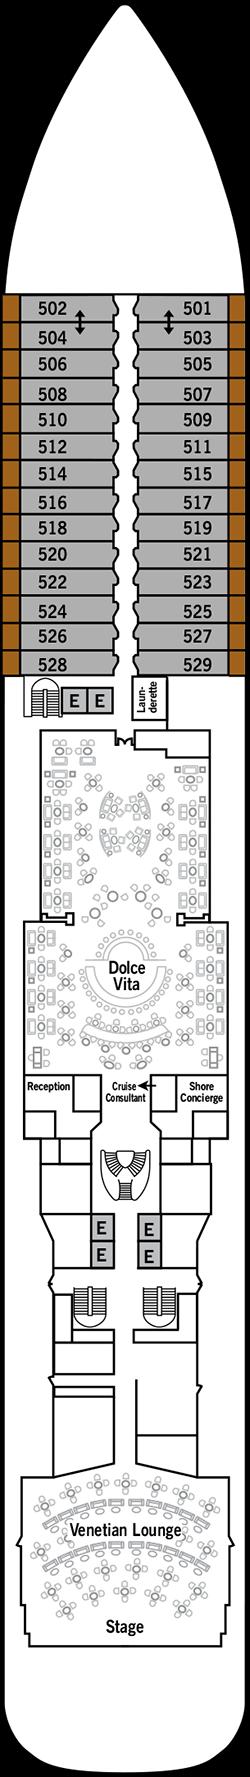 Silver Dawn Deck 5: Deck 5